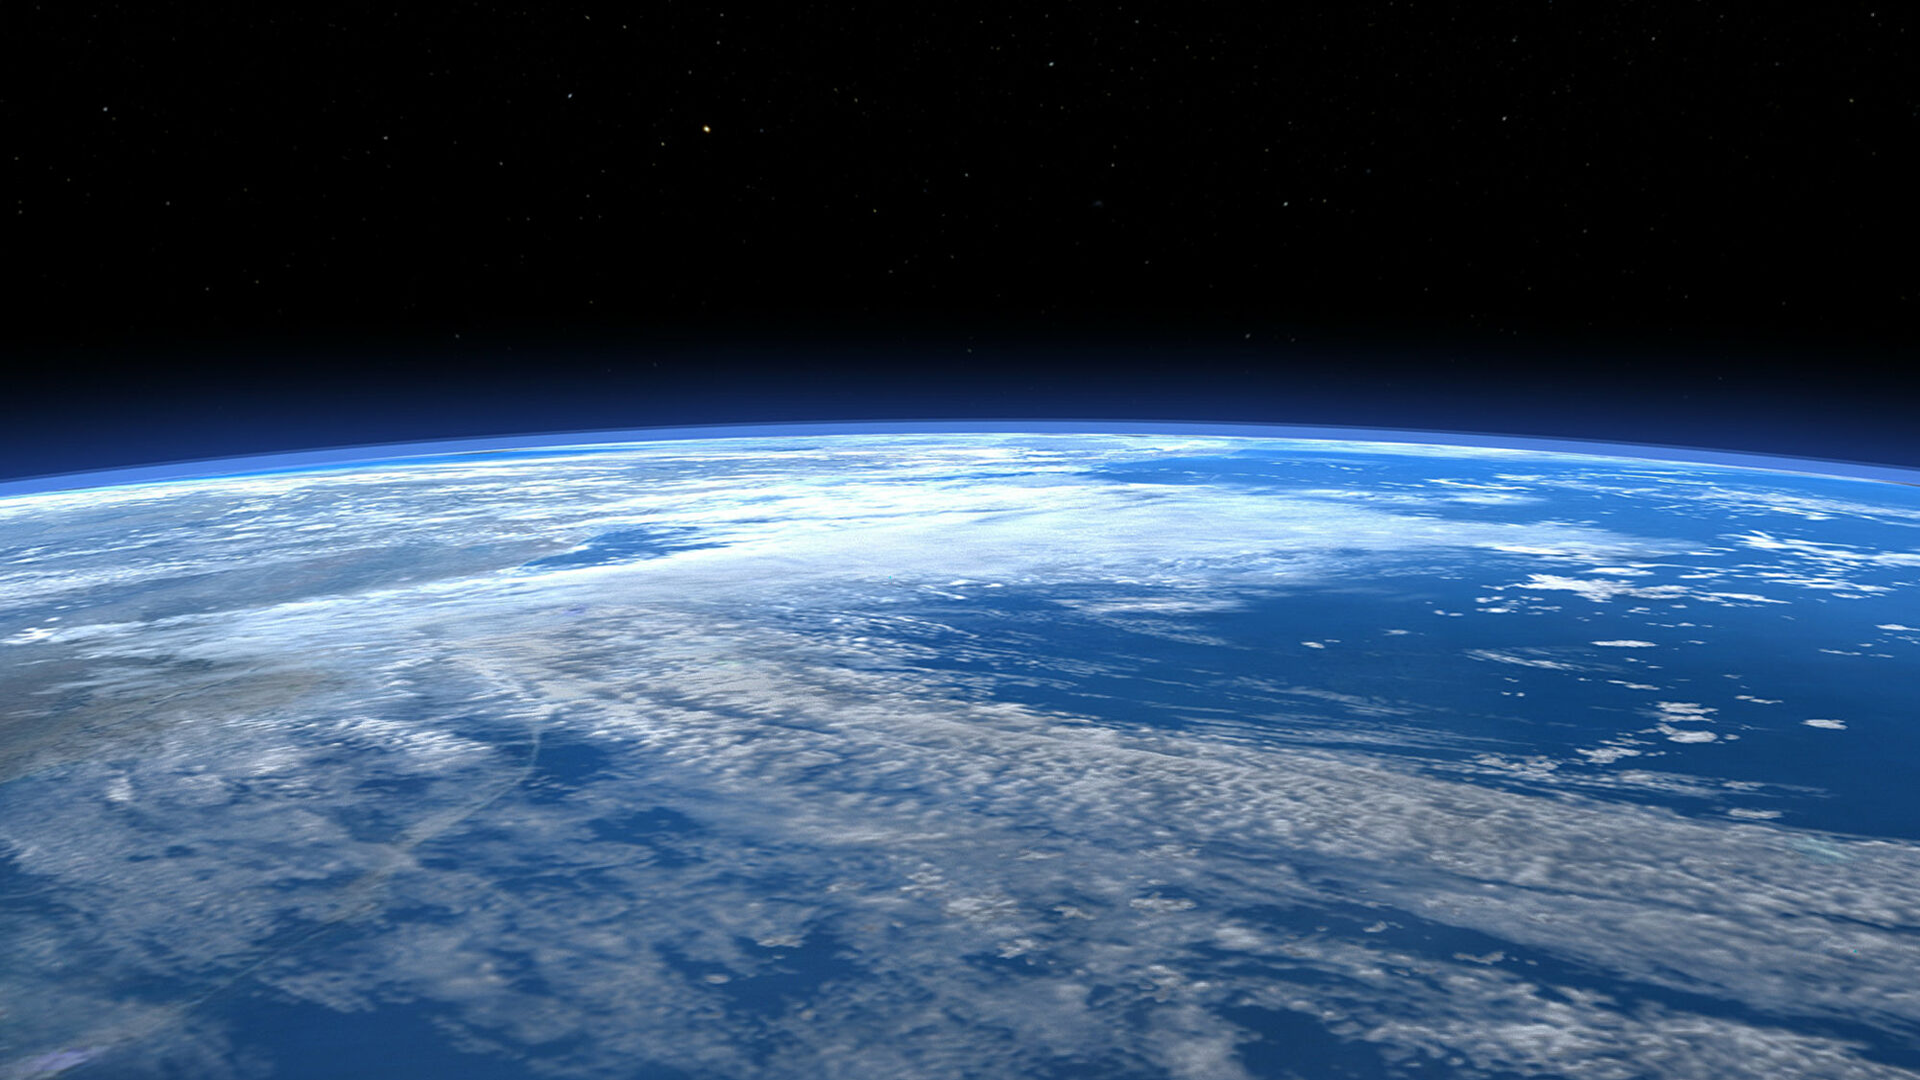 Вид на планету Земля из космоса - РИА Новости, 1920, 10.05.2021